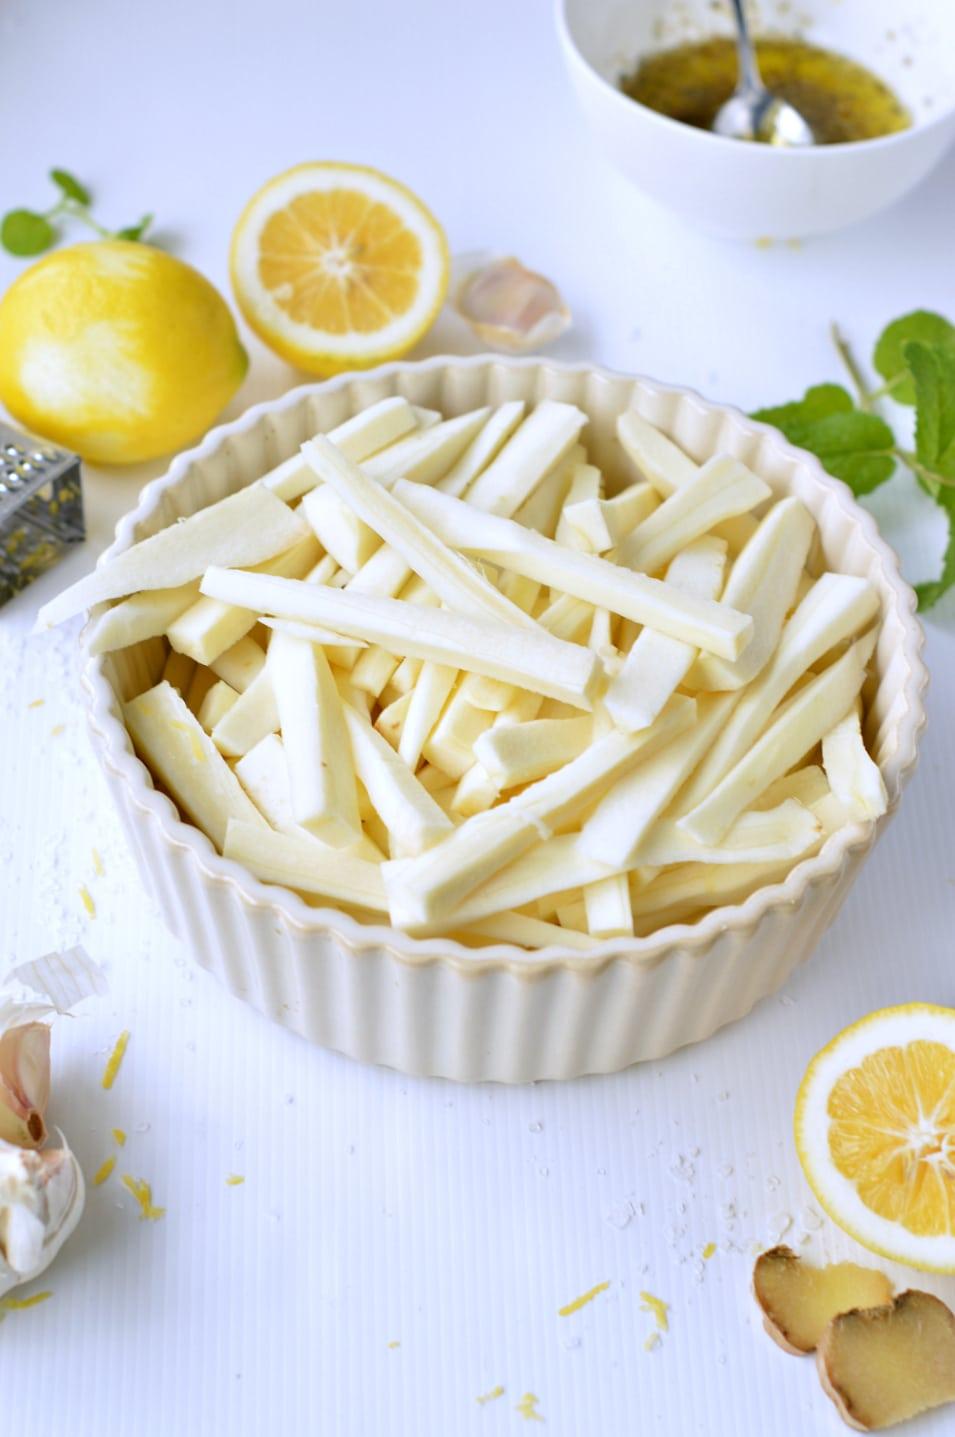 parsnip fries cut